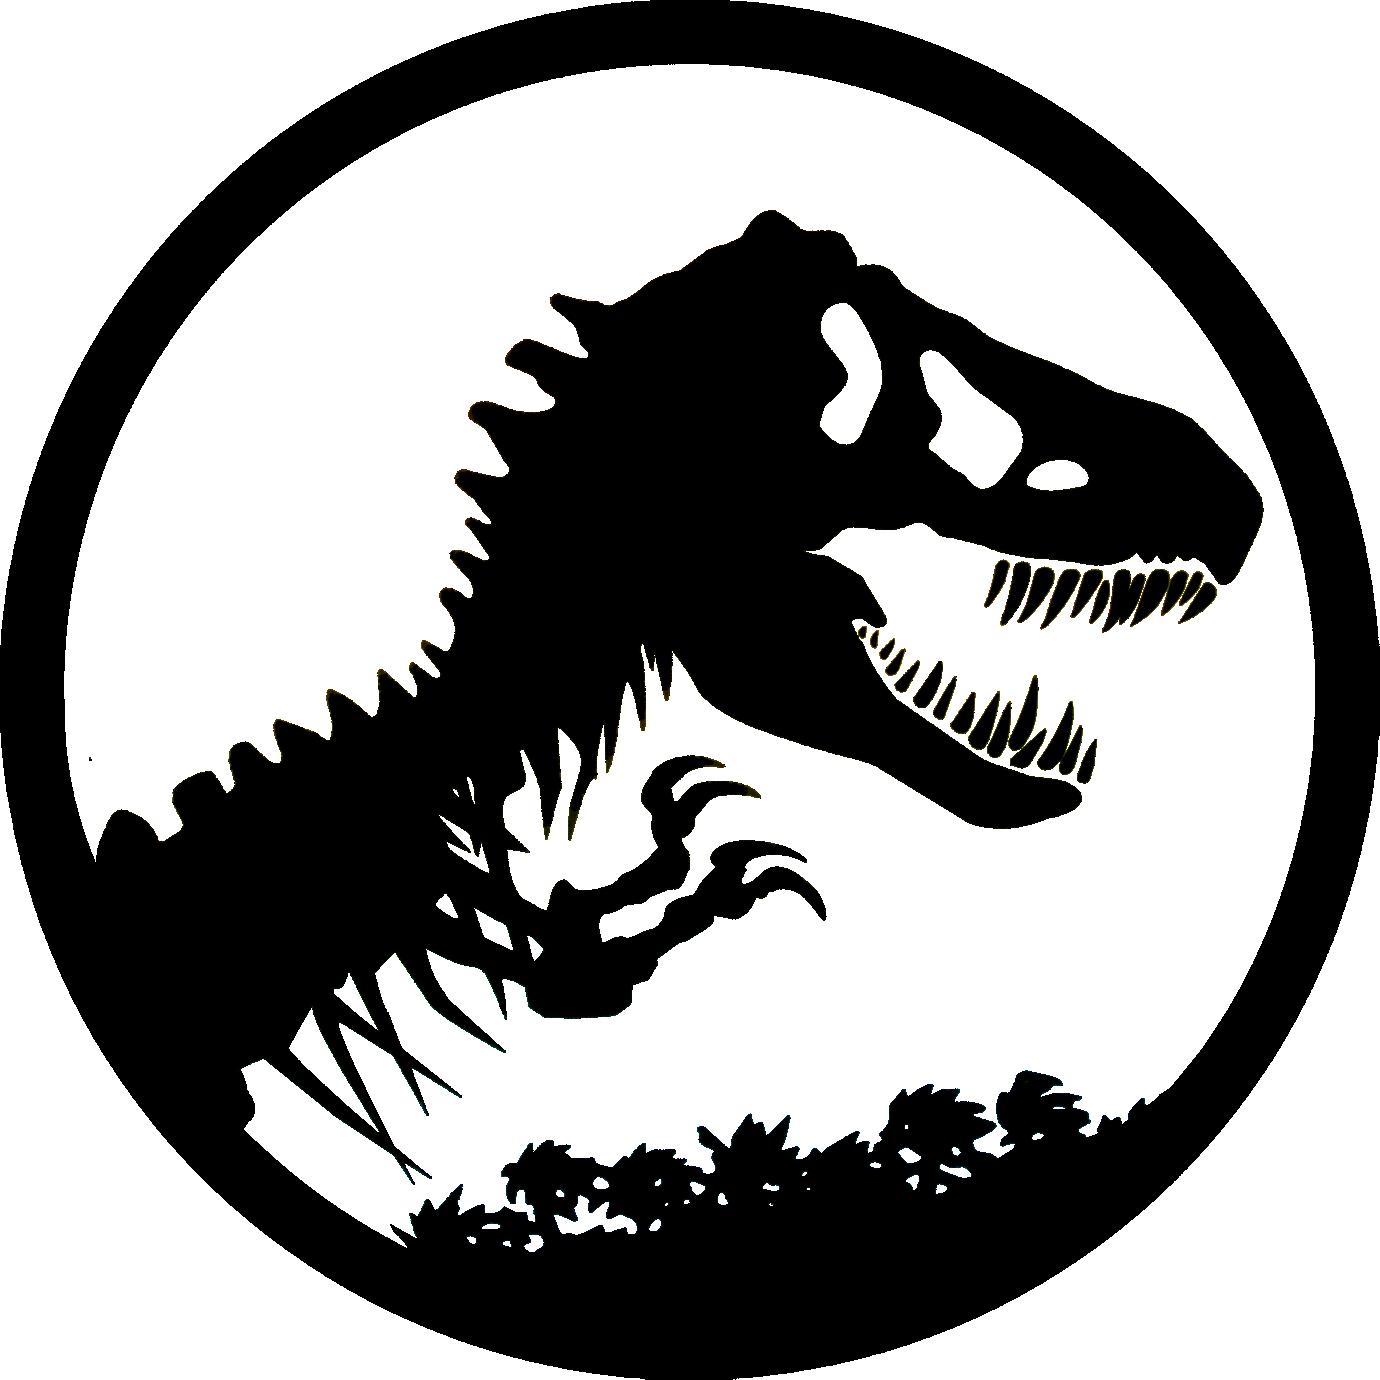 Jurassic Park PNG - 68078